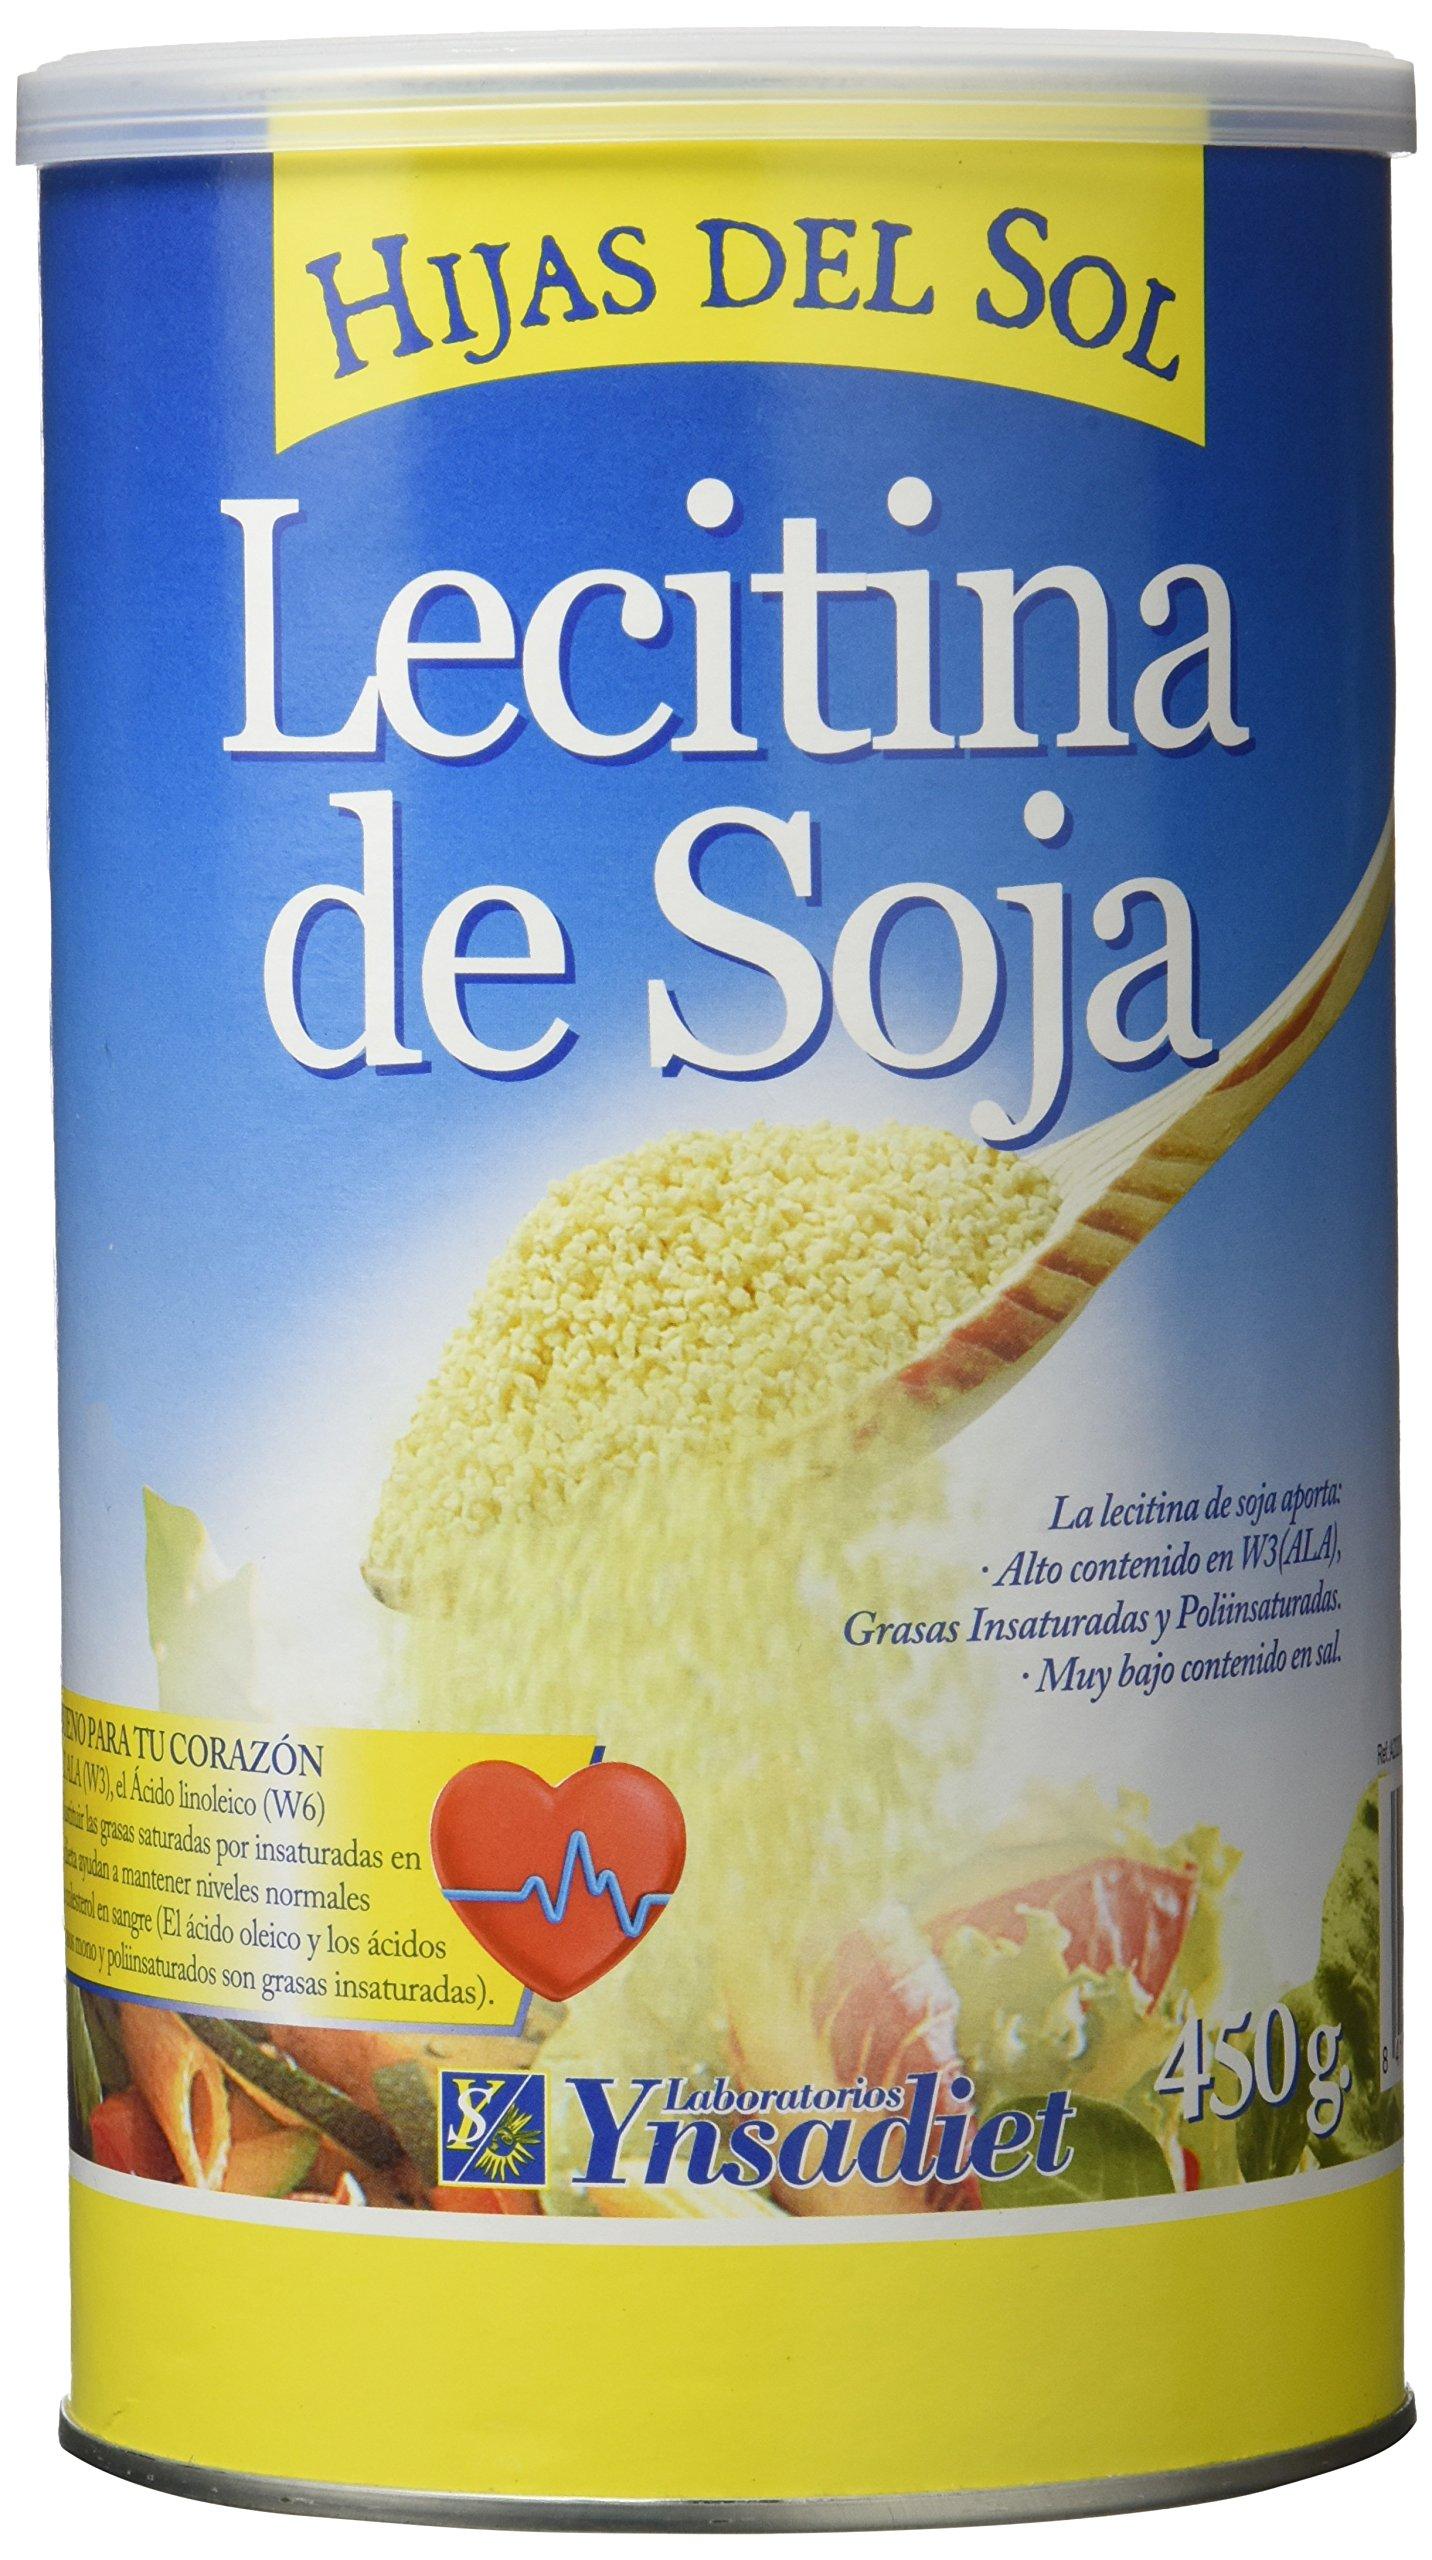 Ynsadiet LECITINA DE SOJA granulada 450gr.GMO HIJAS DEL SOL - 450 gr product image